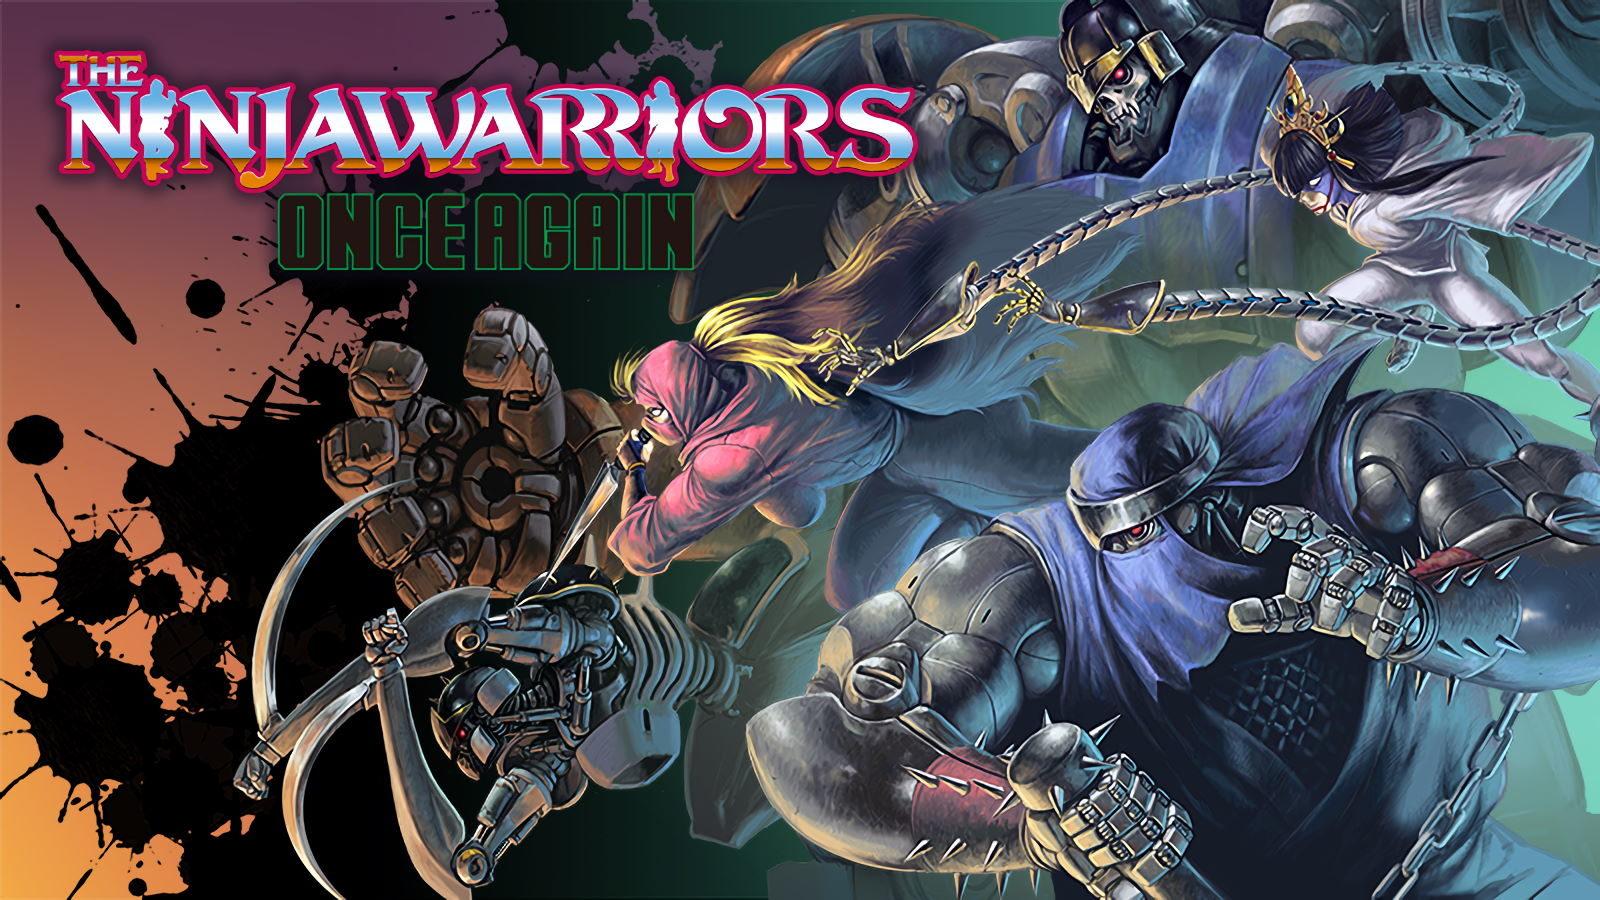 Test : The Ninja Warriors Once Again 2